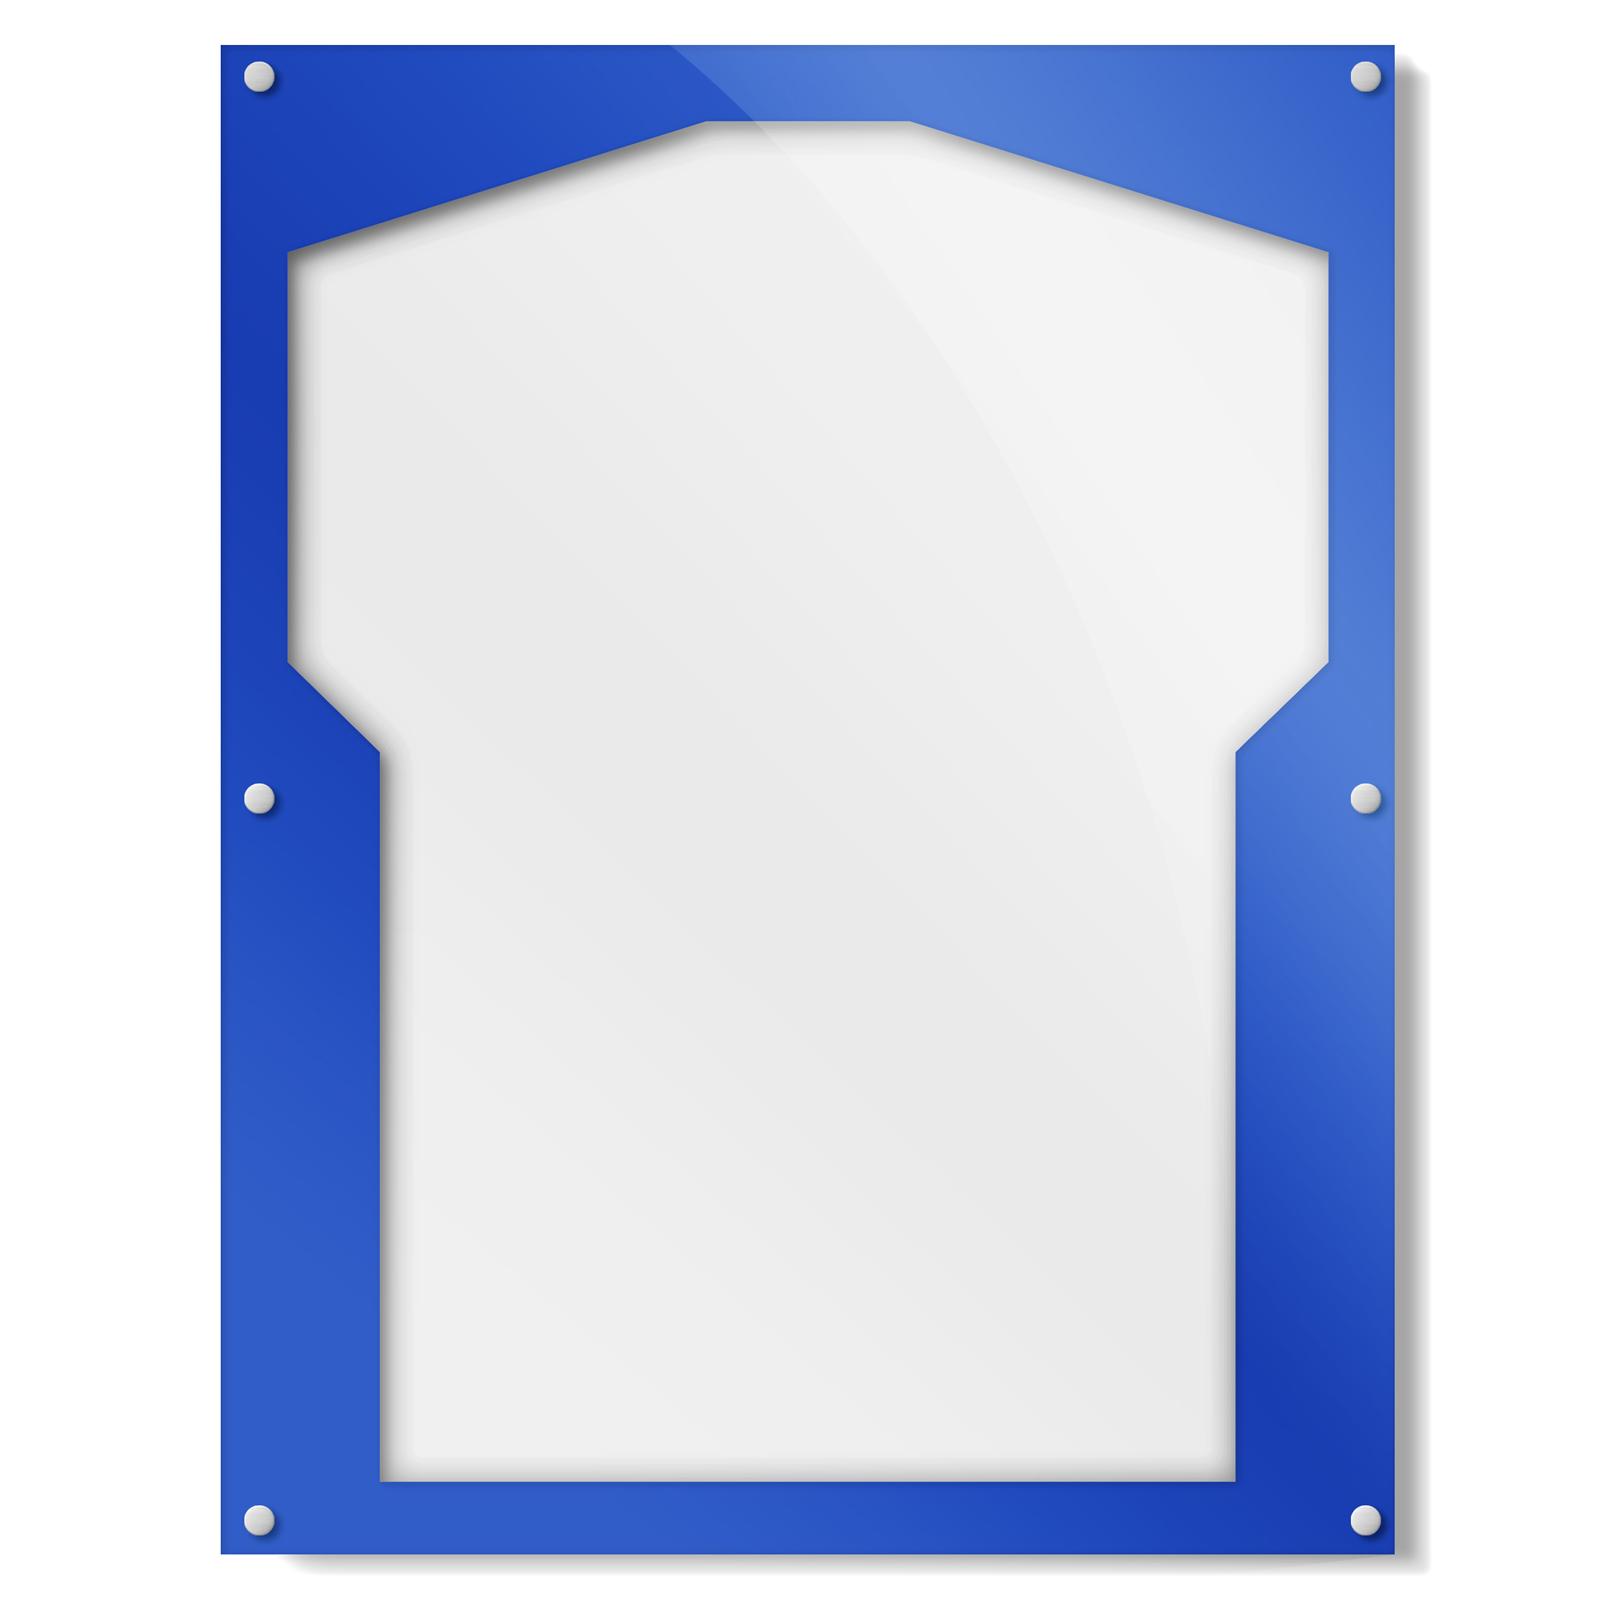 Blue Border Shirt Frame